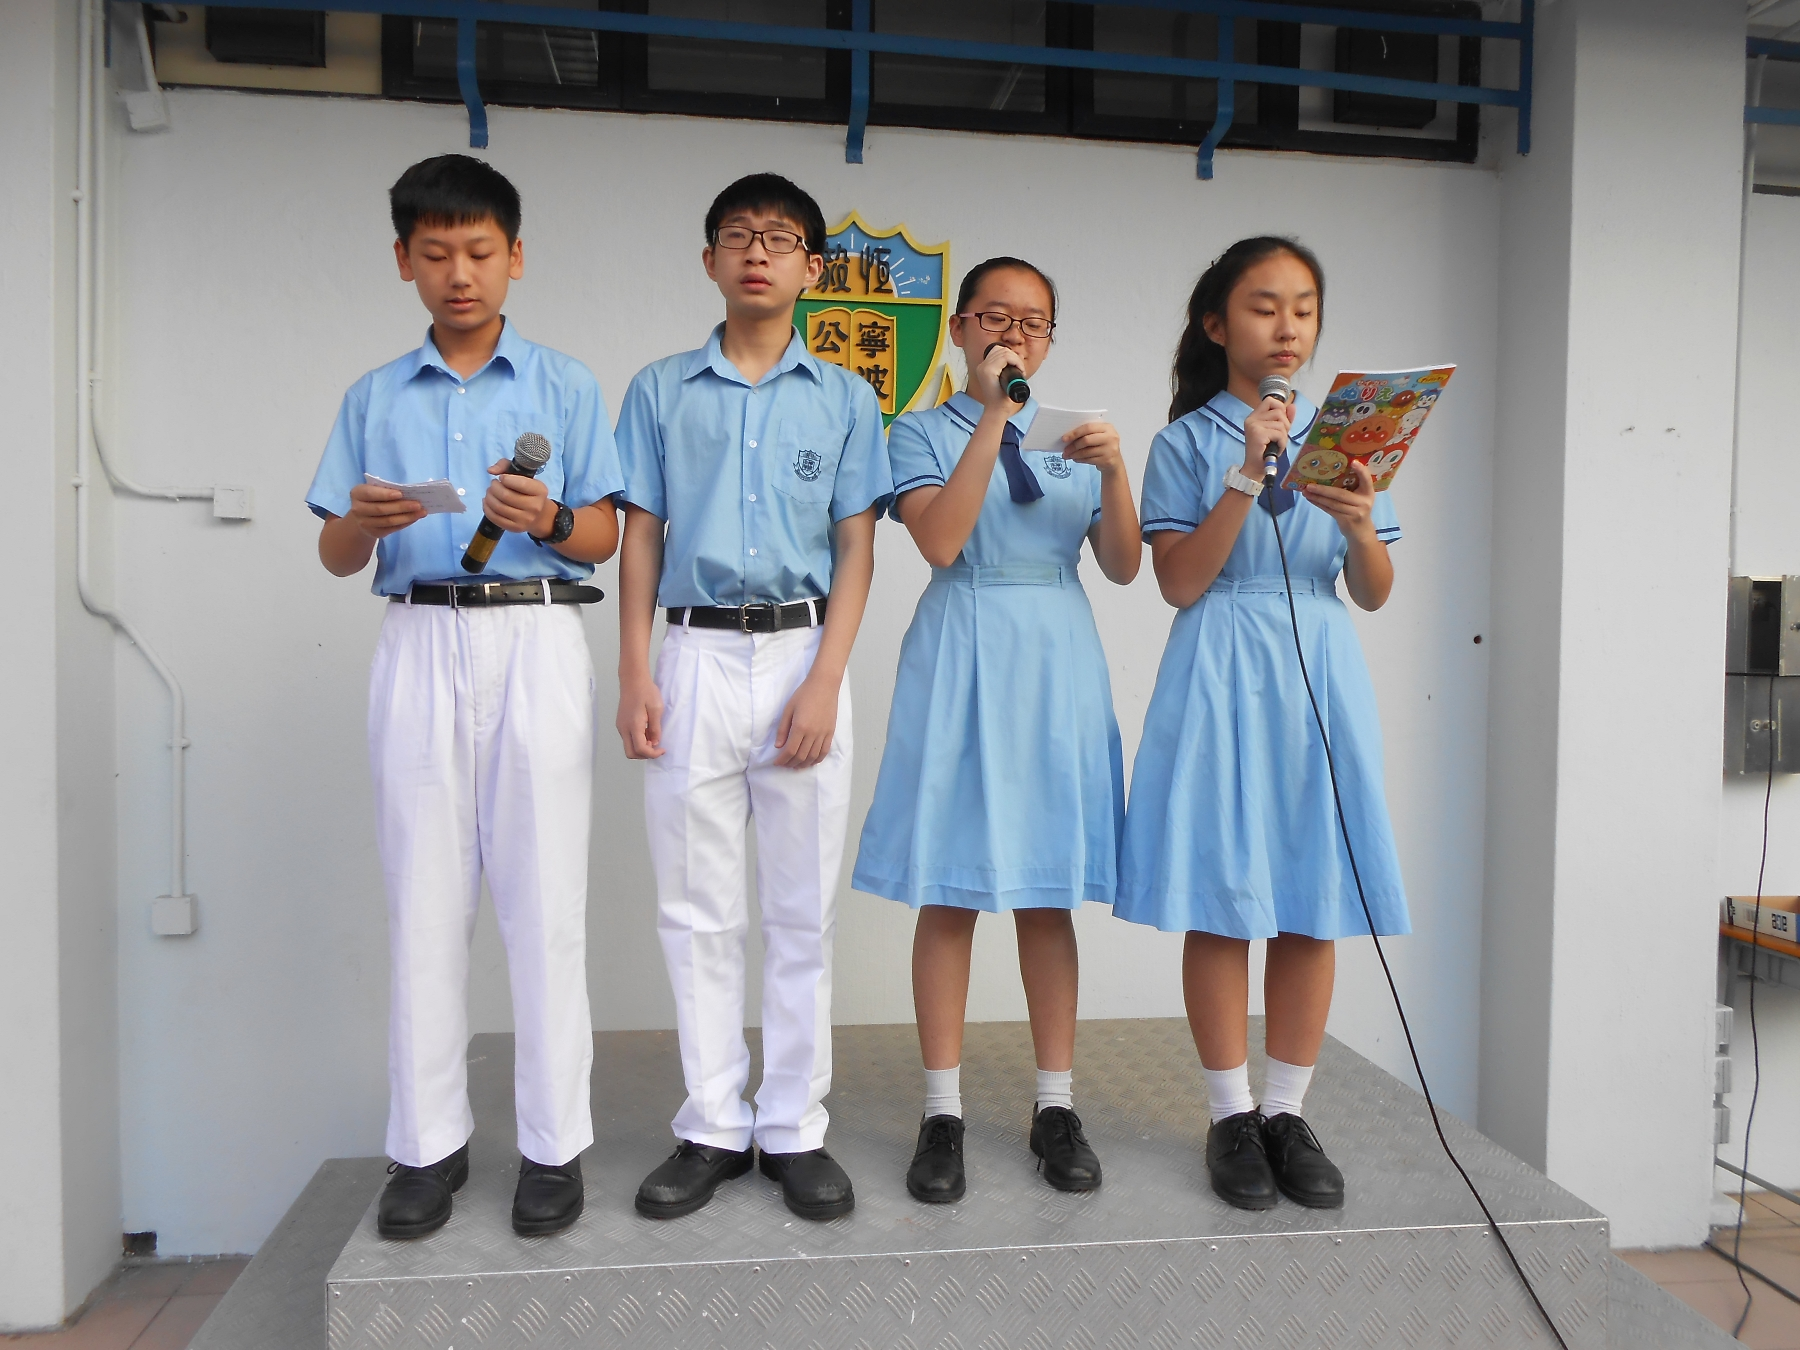 http://npc.edu.hk/sites/default/files/dscn1432.jpg